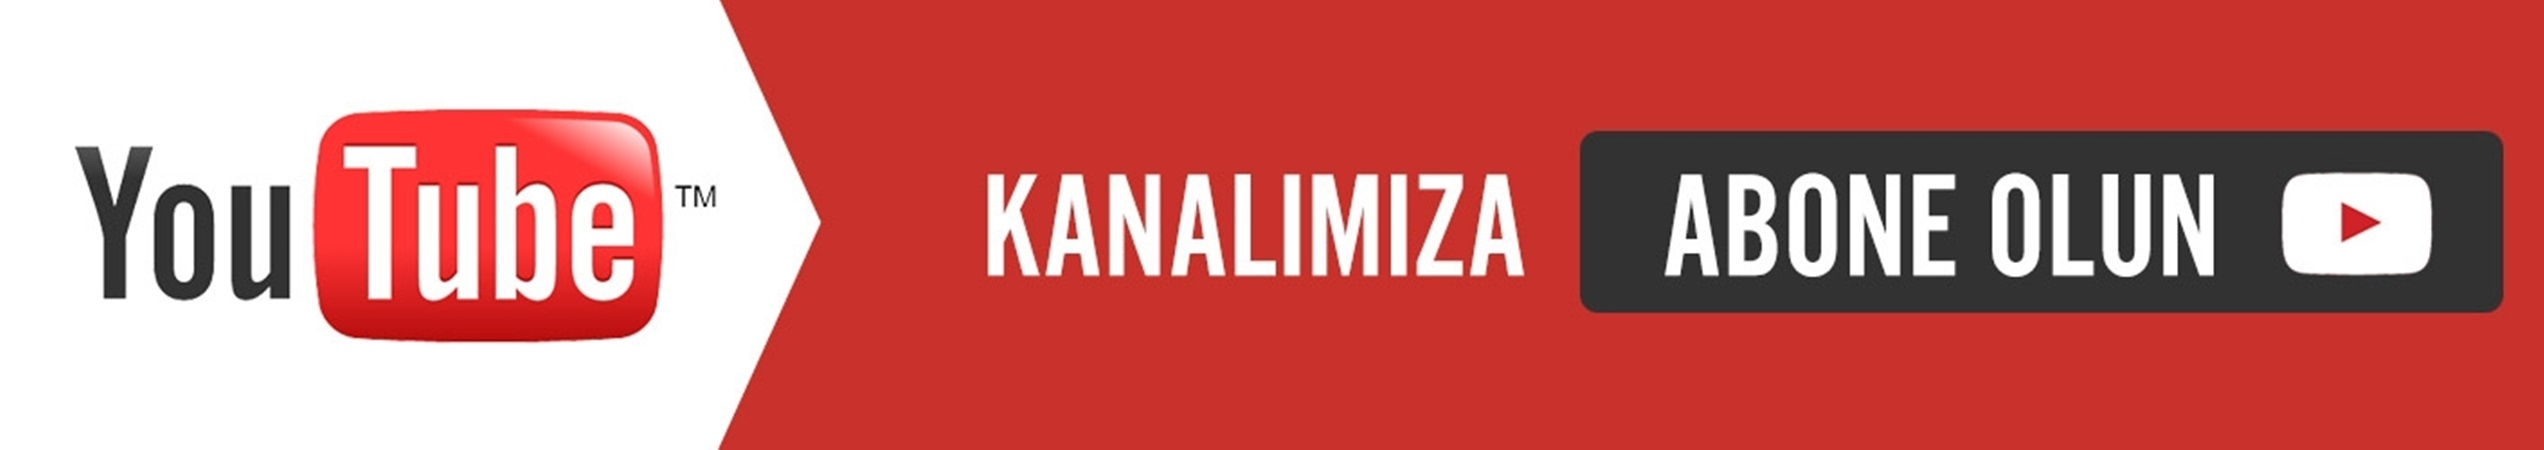 KANDIRA HABER YOUTUBE KANALIMIZA ABONE OLUN